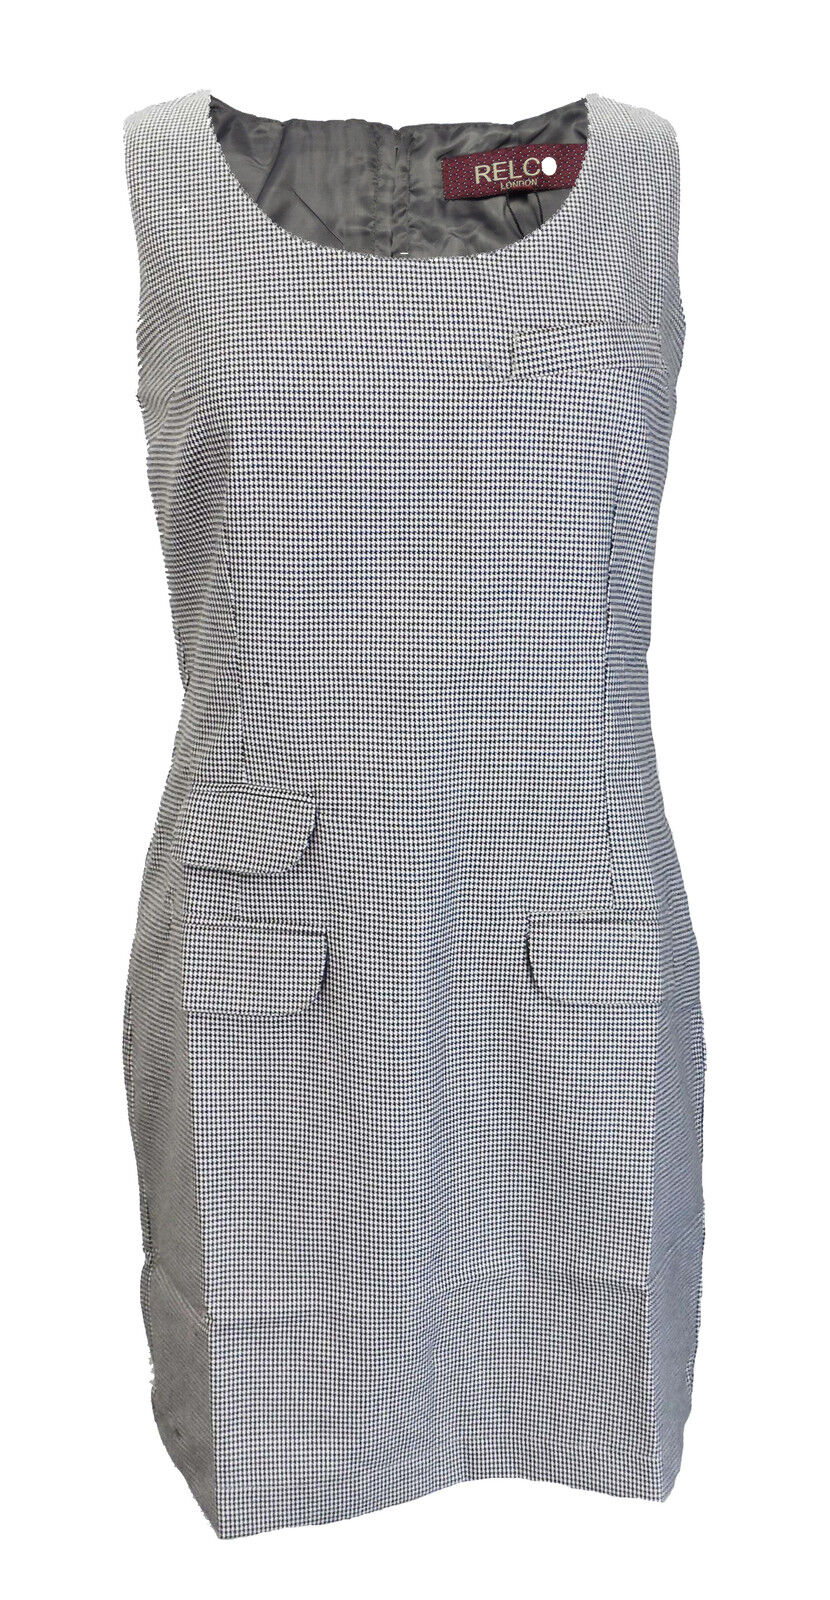 DaMänner Retro Mod Hahnentritt Pinafore Tunika Kleid